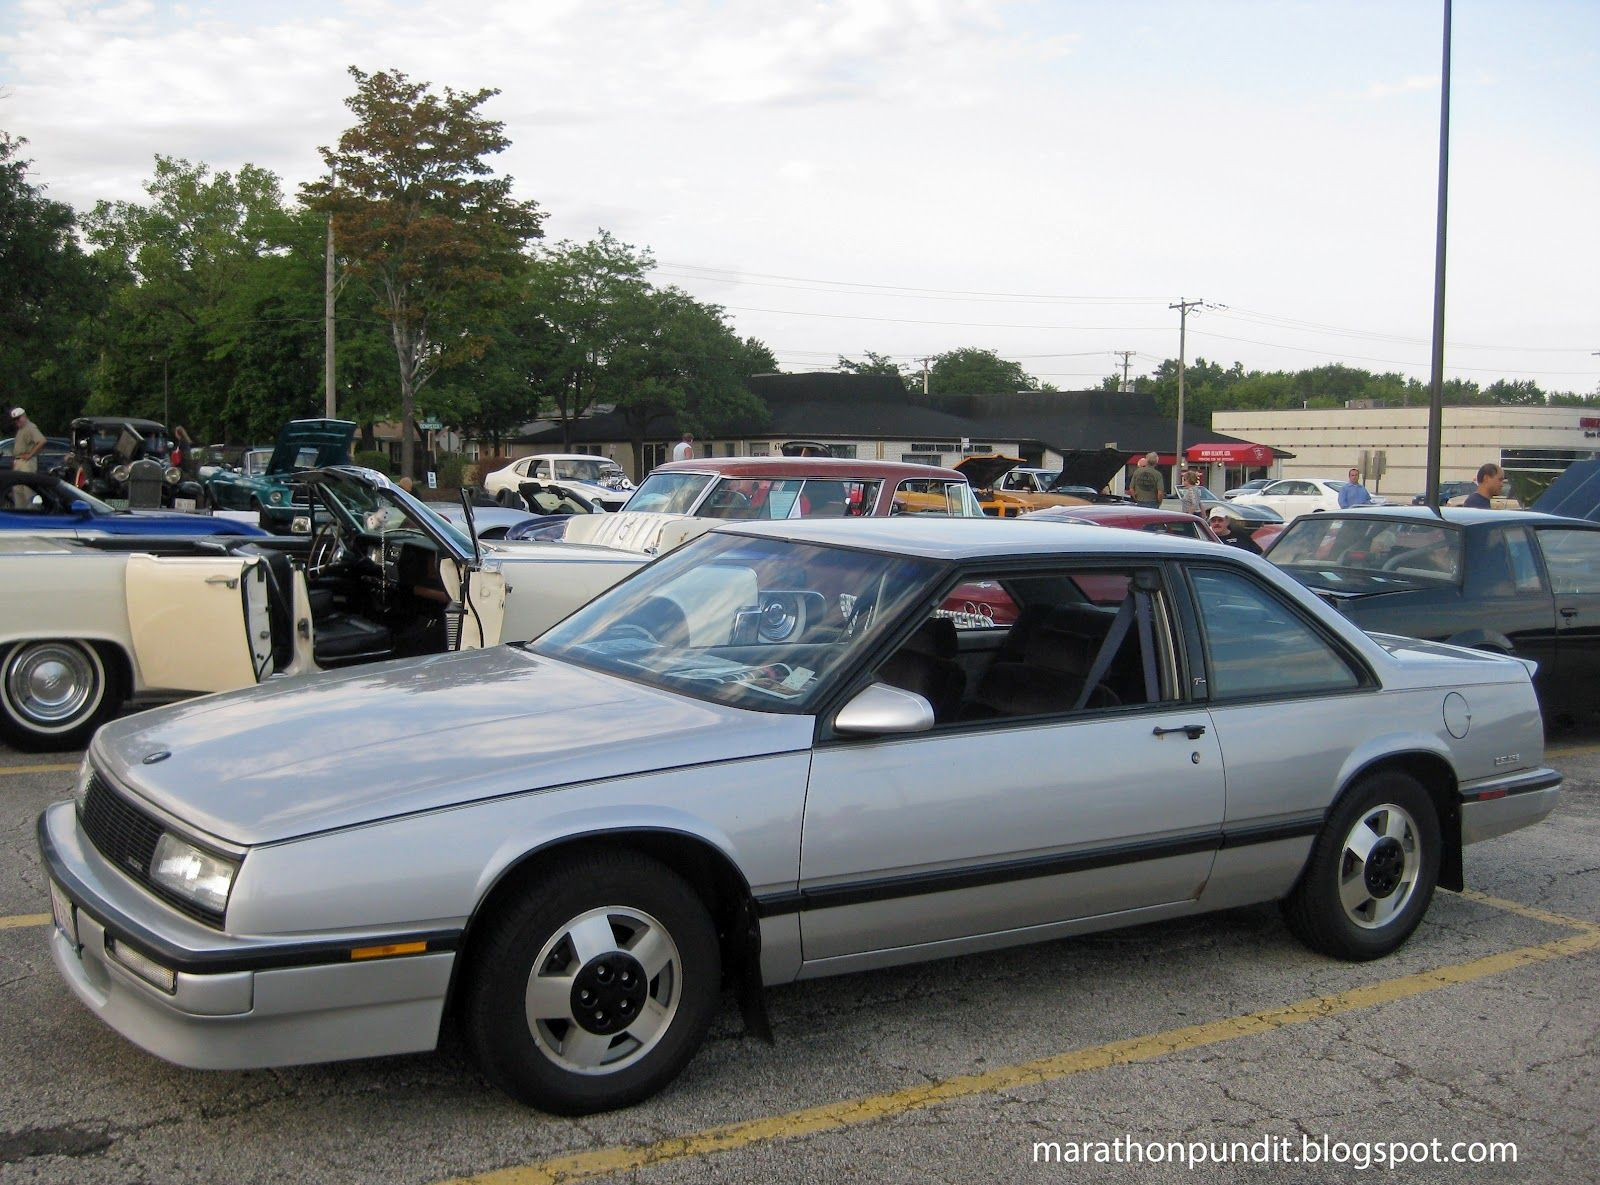 medium resolution of a rare 1989 buick lesabre t type morton grove classic car show july 27 2012